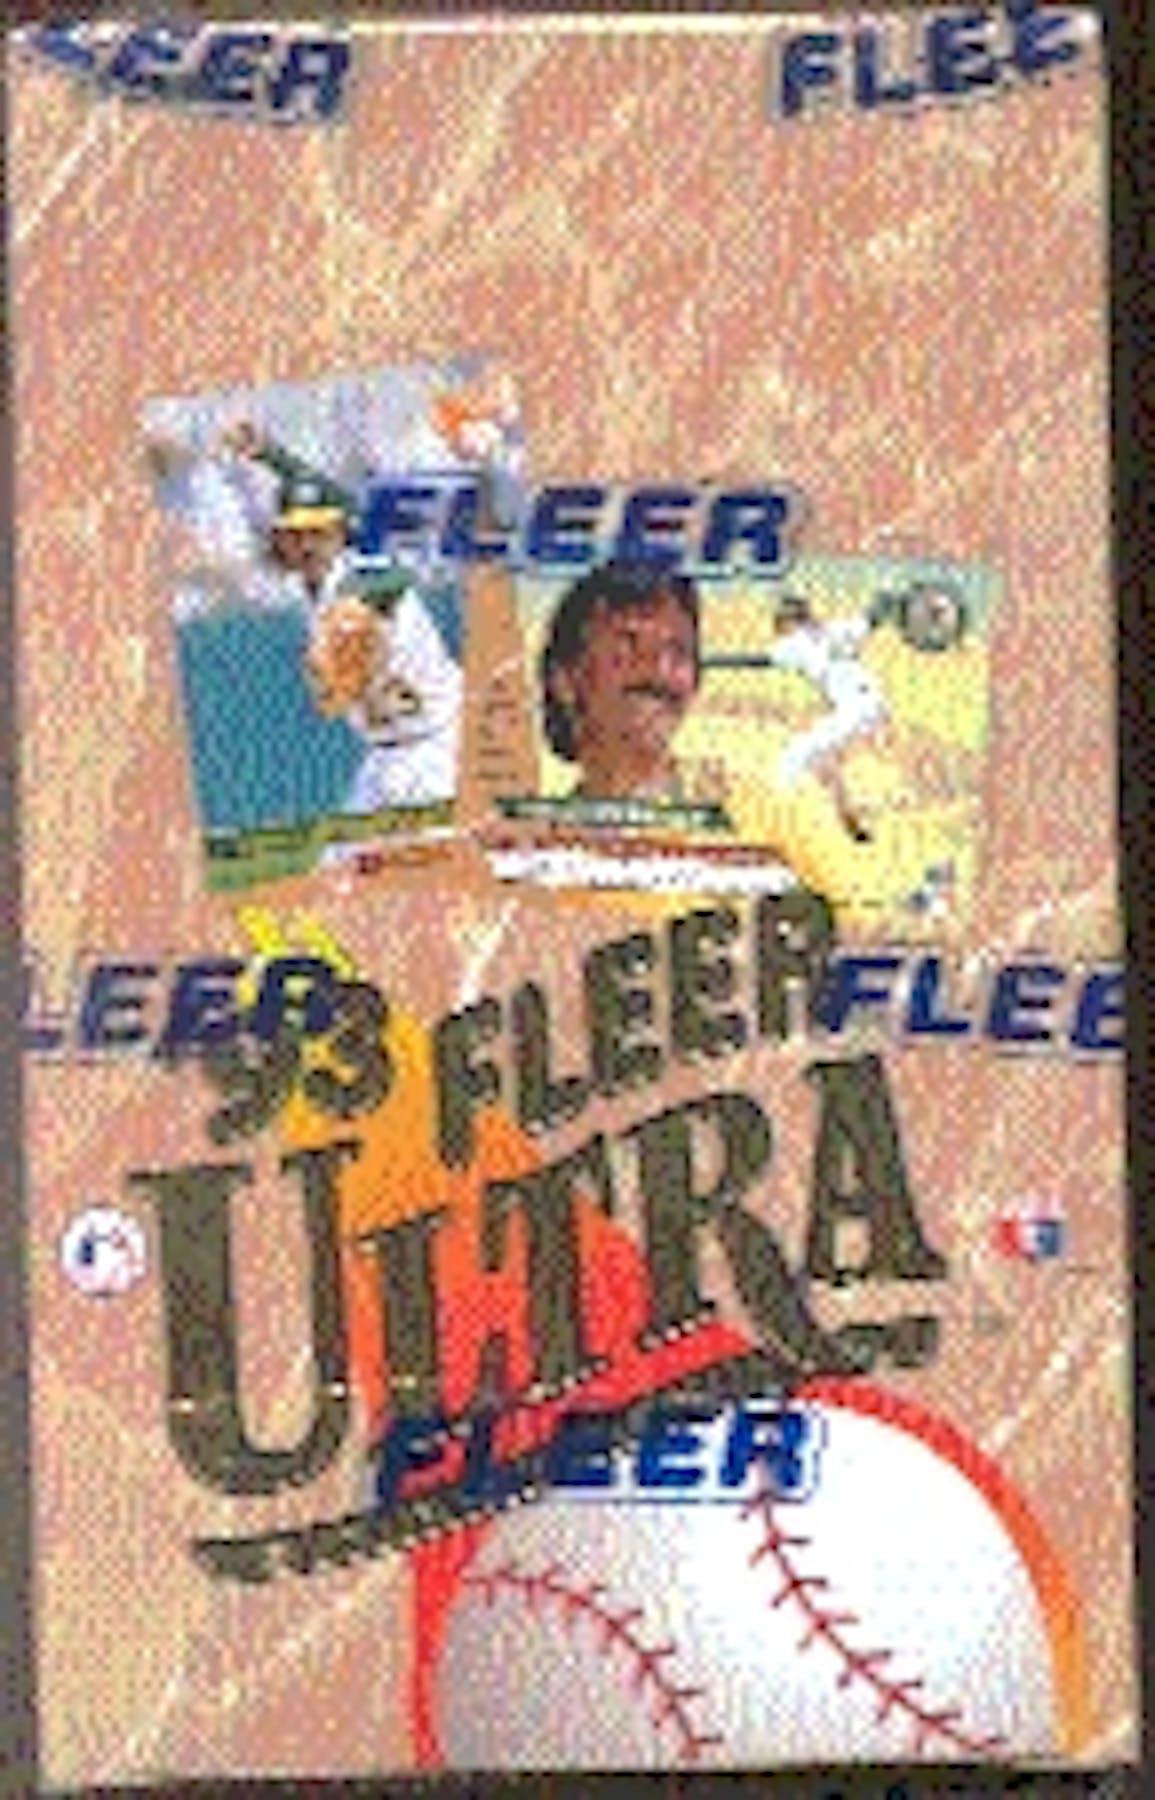 1993 Fleer Ultra Series 1 Baseball Hobby Box Da Card World